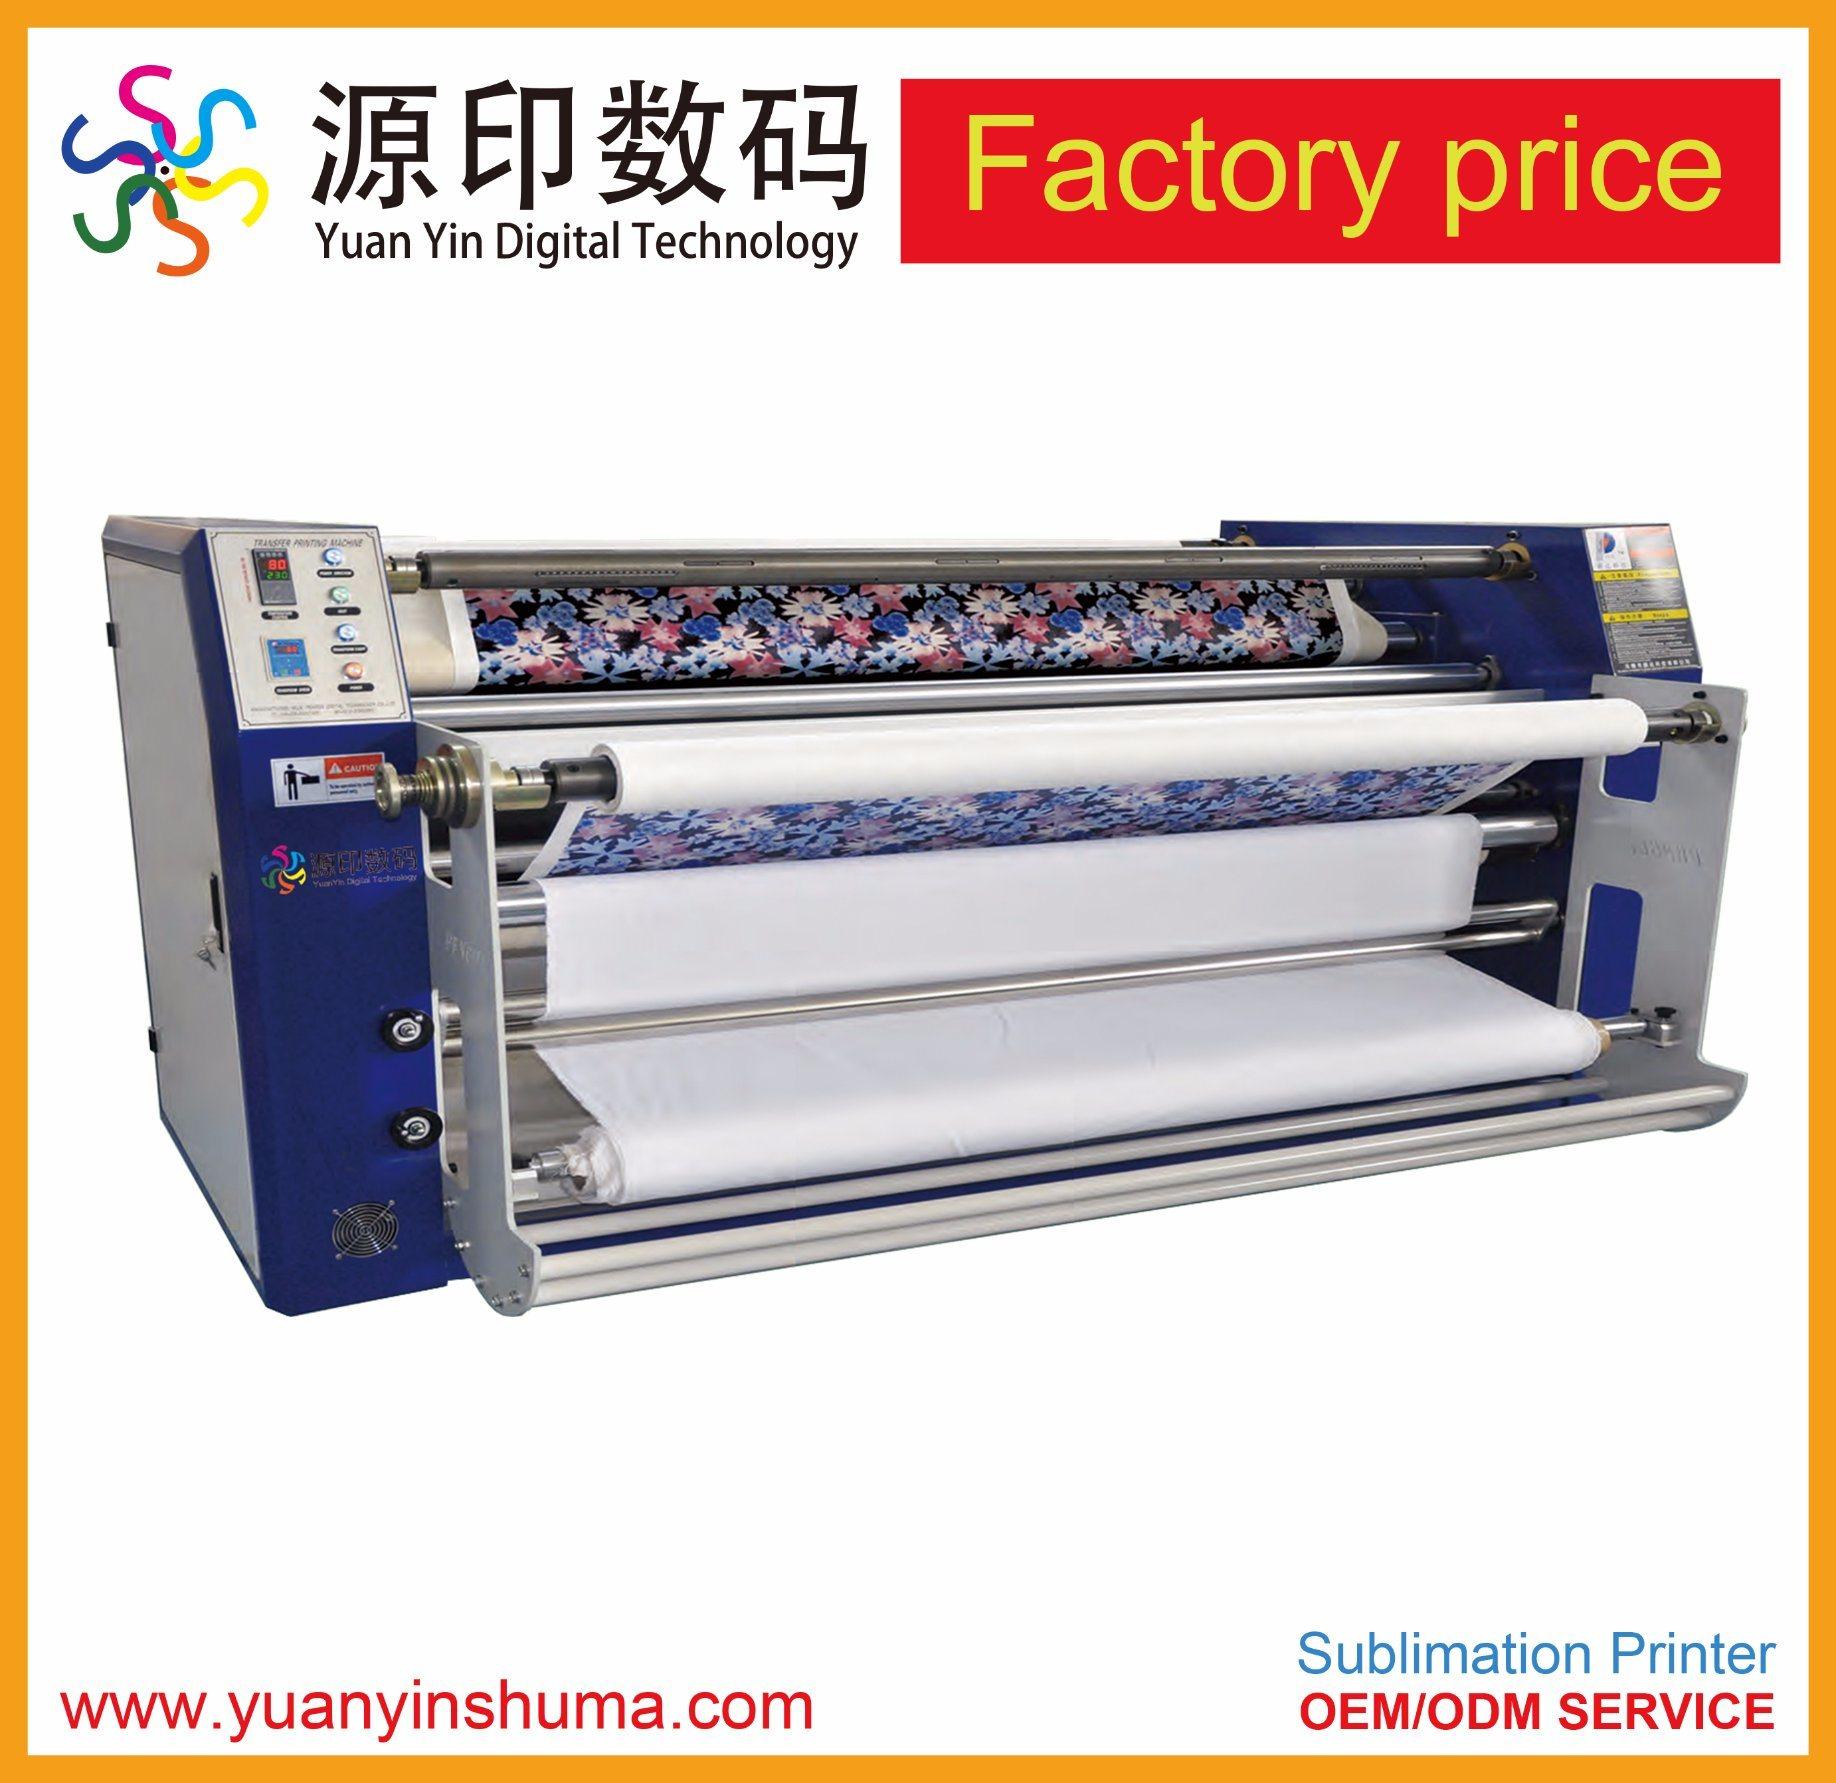 0d907e4e7 China Best Price Large Format Width Heat Transfer Printer - China Ce  Certification Sublimation Printer, High Speed Sublimation Printer